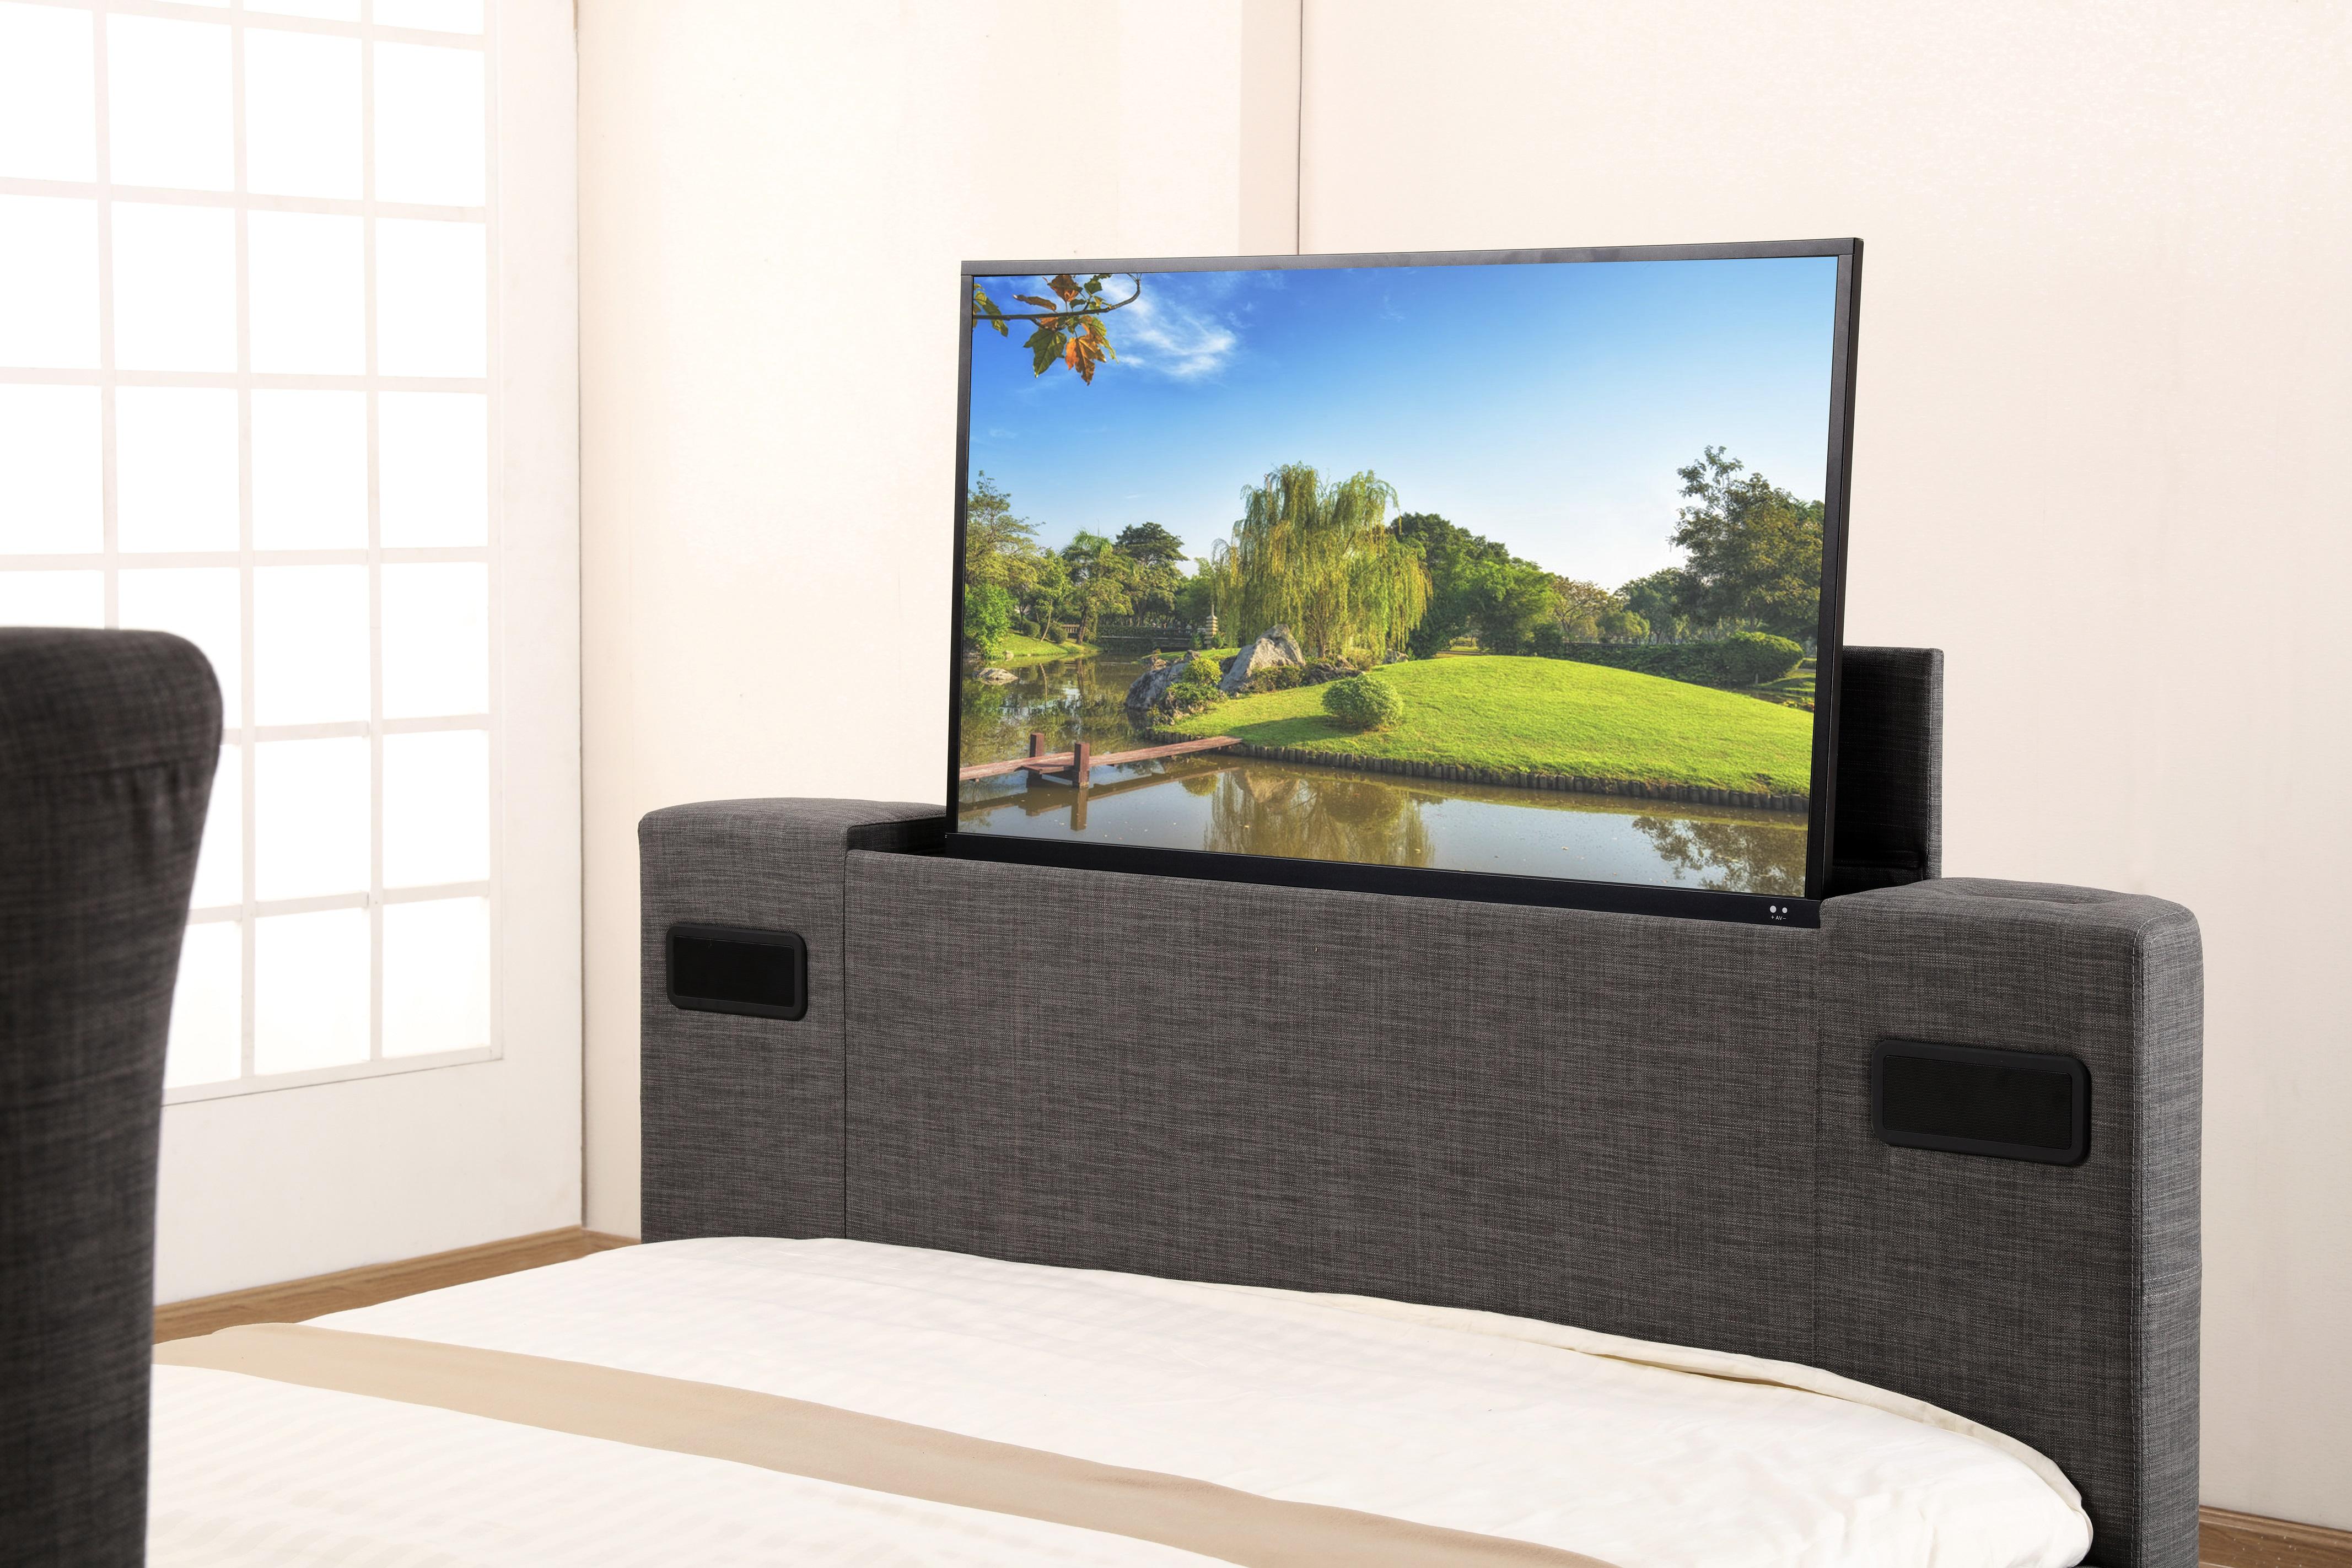 46 Double Grey Fabric Music Tv Bed Designer Headboard Bluetooth